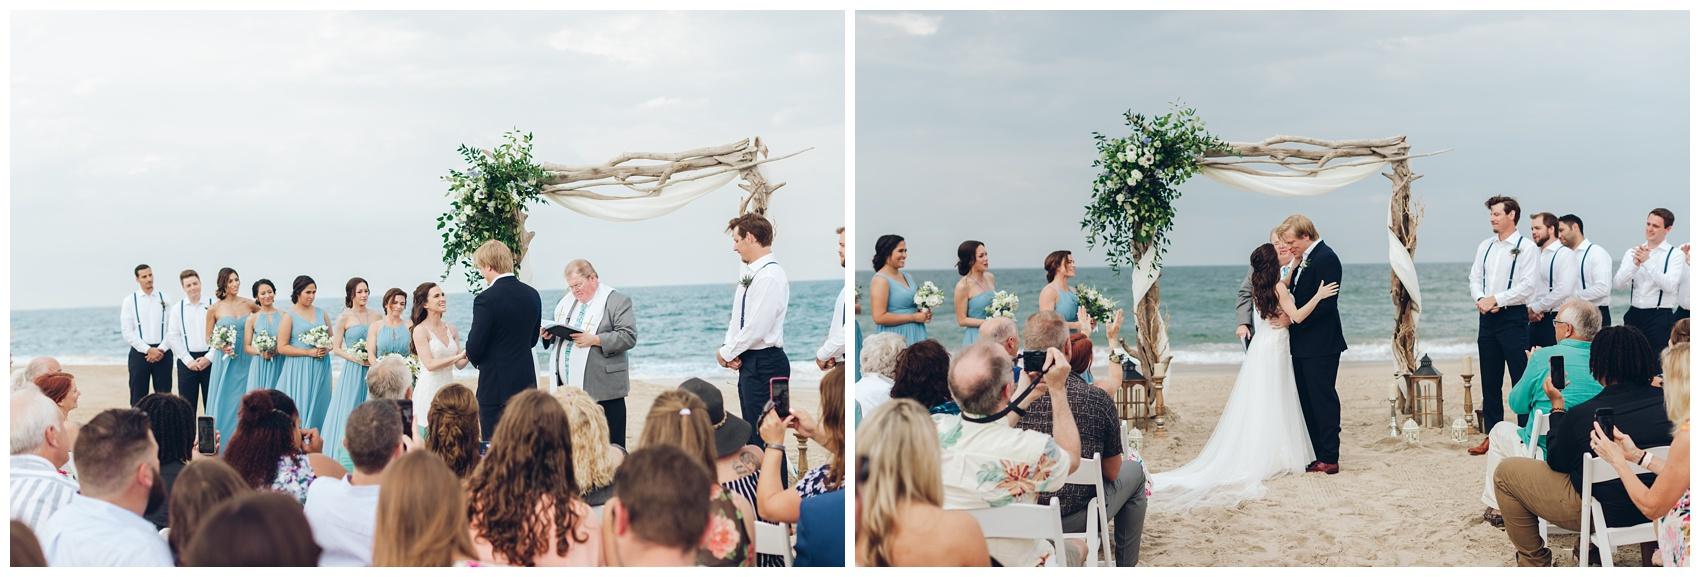 Outer-Banks-Corolla-Wedding_0069.jpg